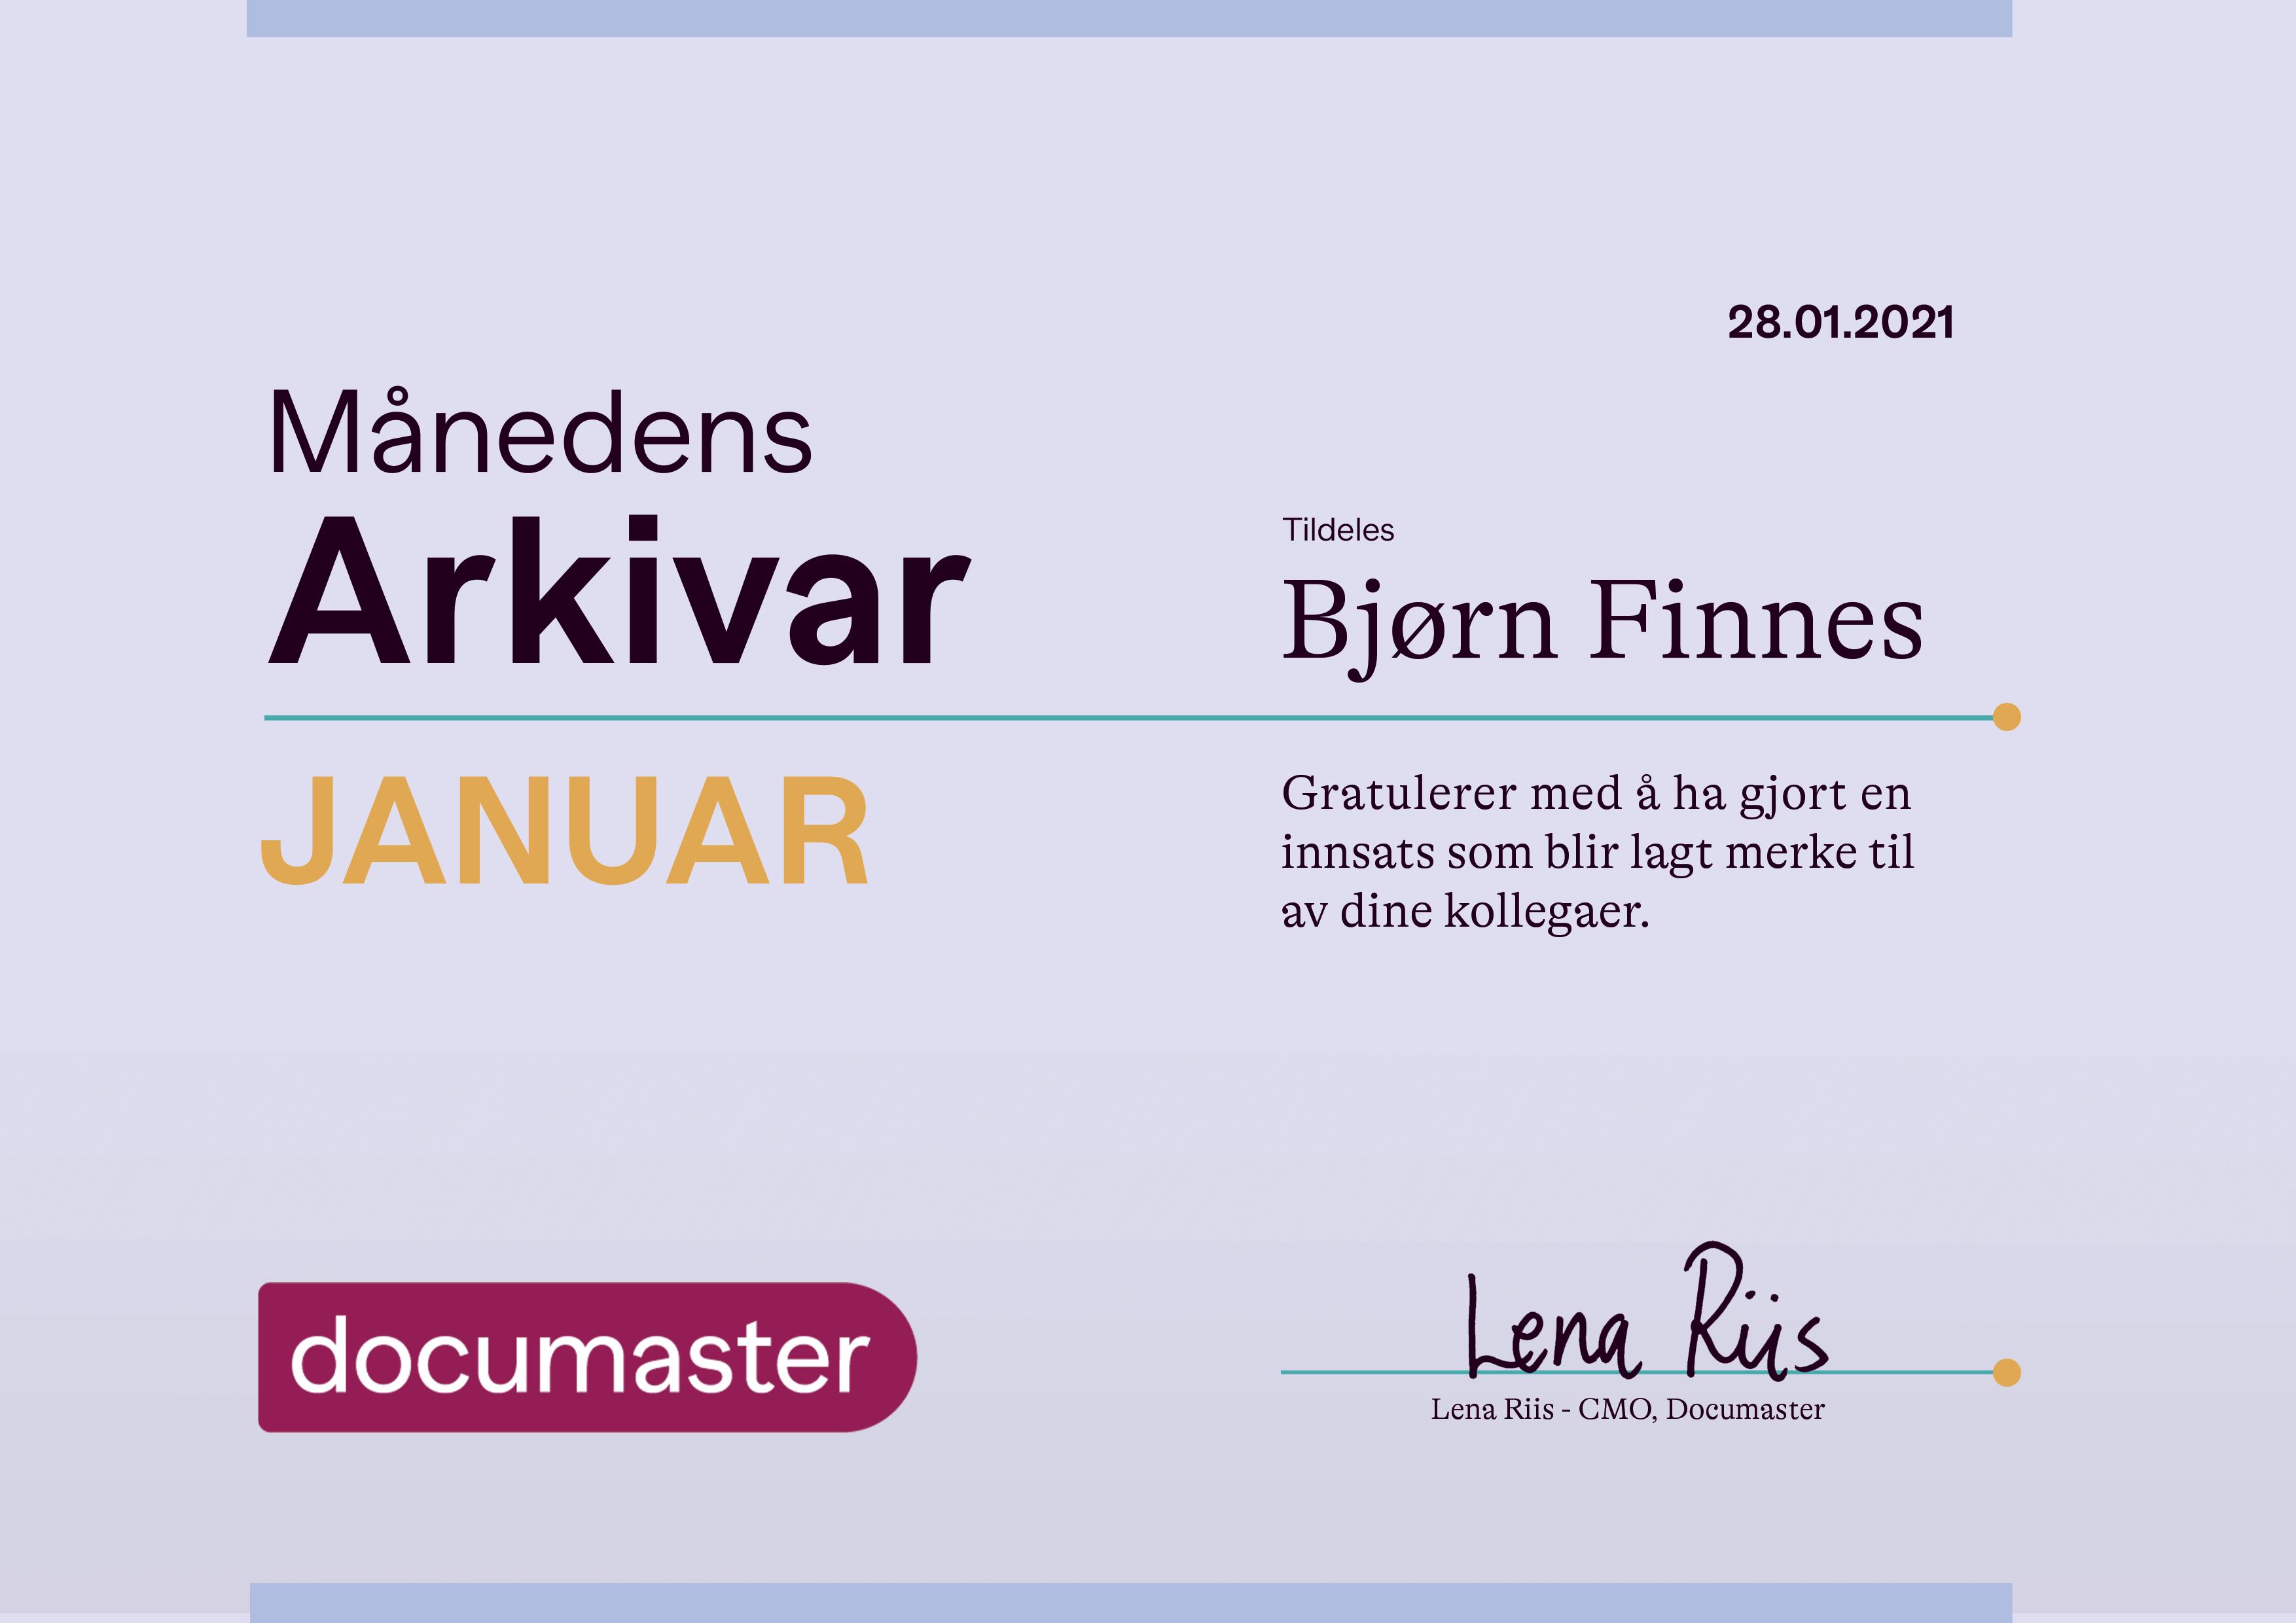 Månedens arkivar Januar 2021 - Bjørn Finnes